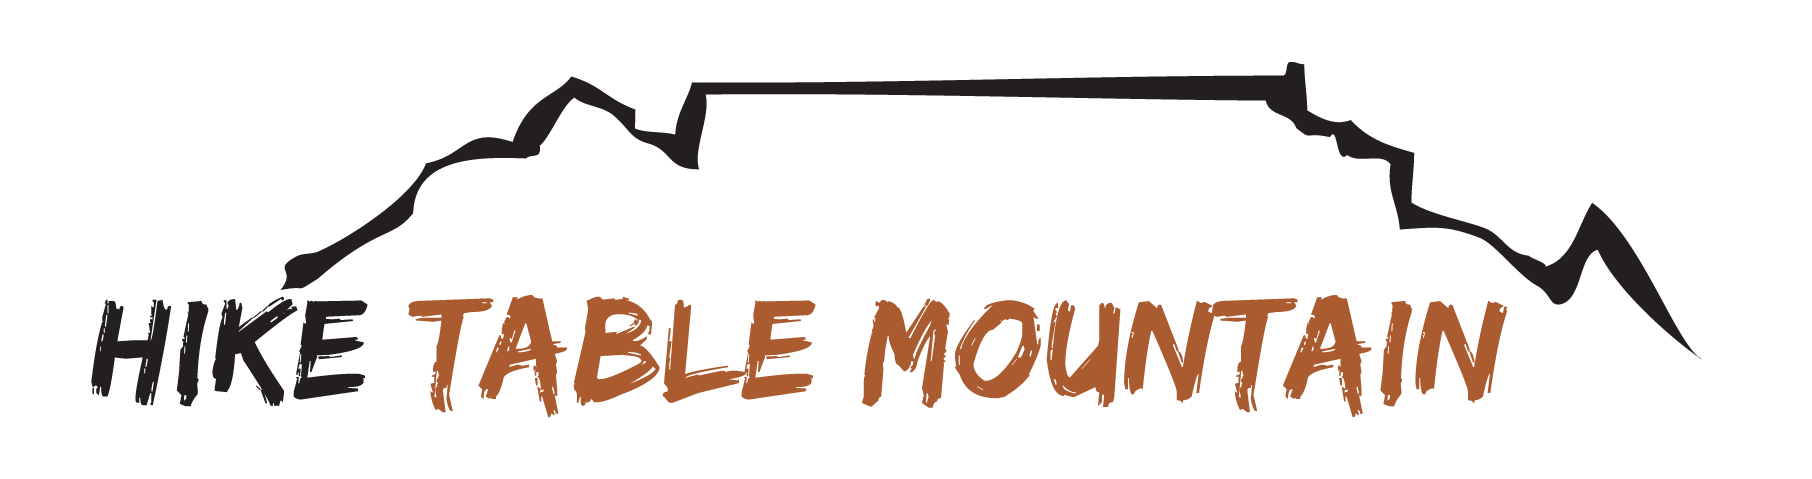 1812x479 Hike Table Mountain Logo.png